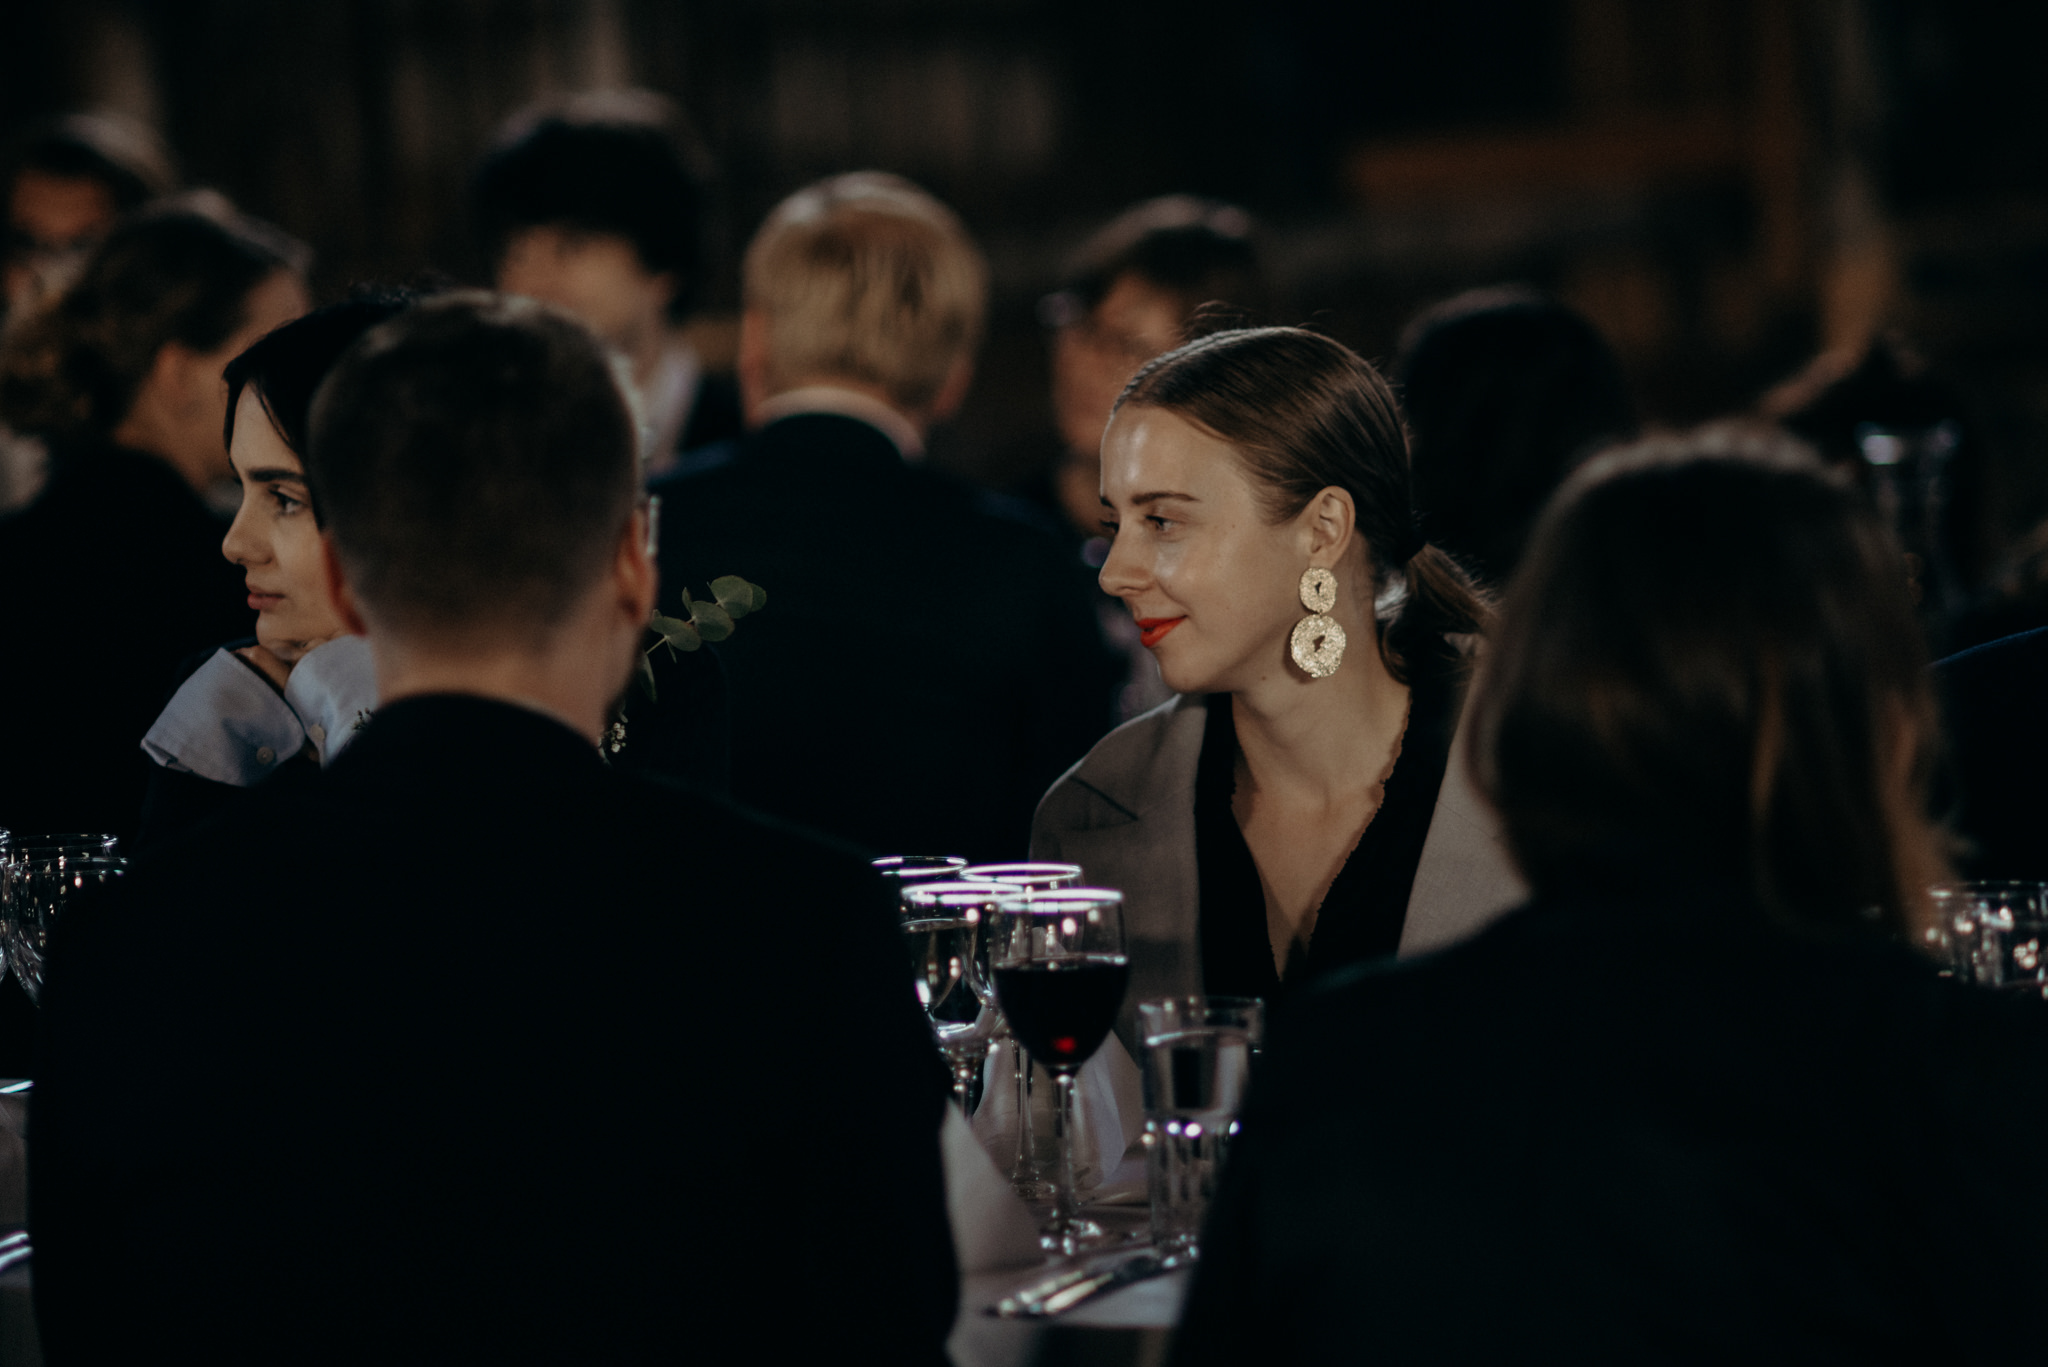 Guests listening during speeches at Valkosaaren Telakka wedding reception